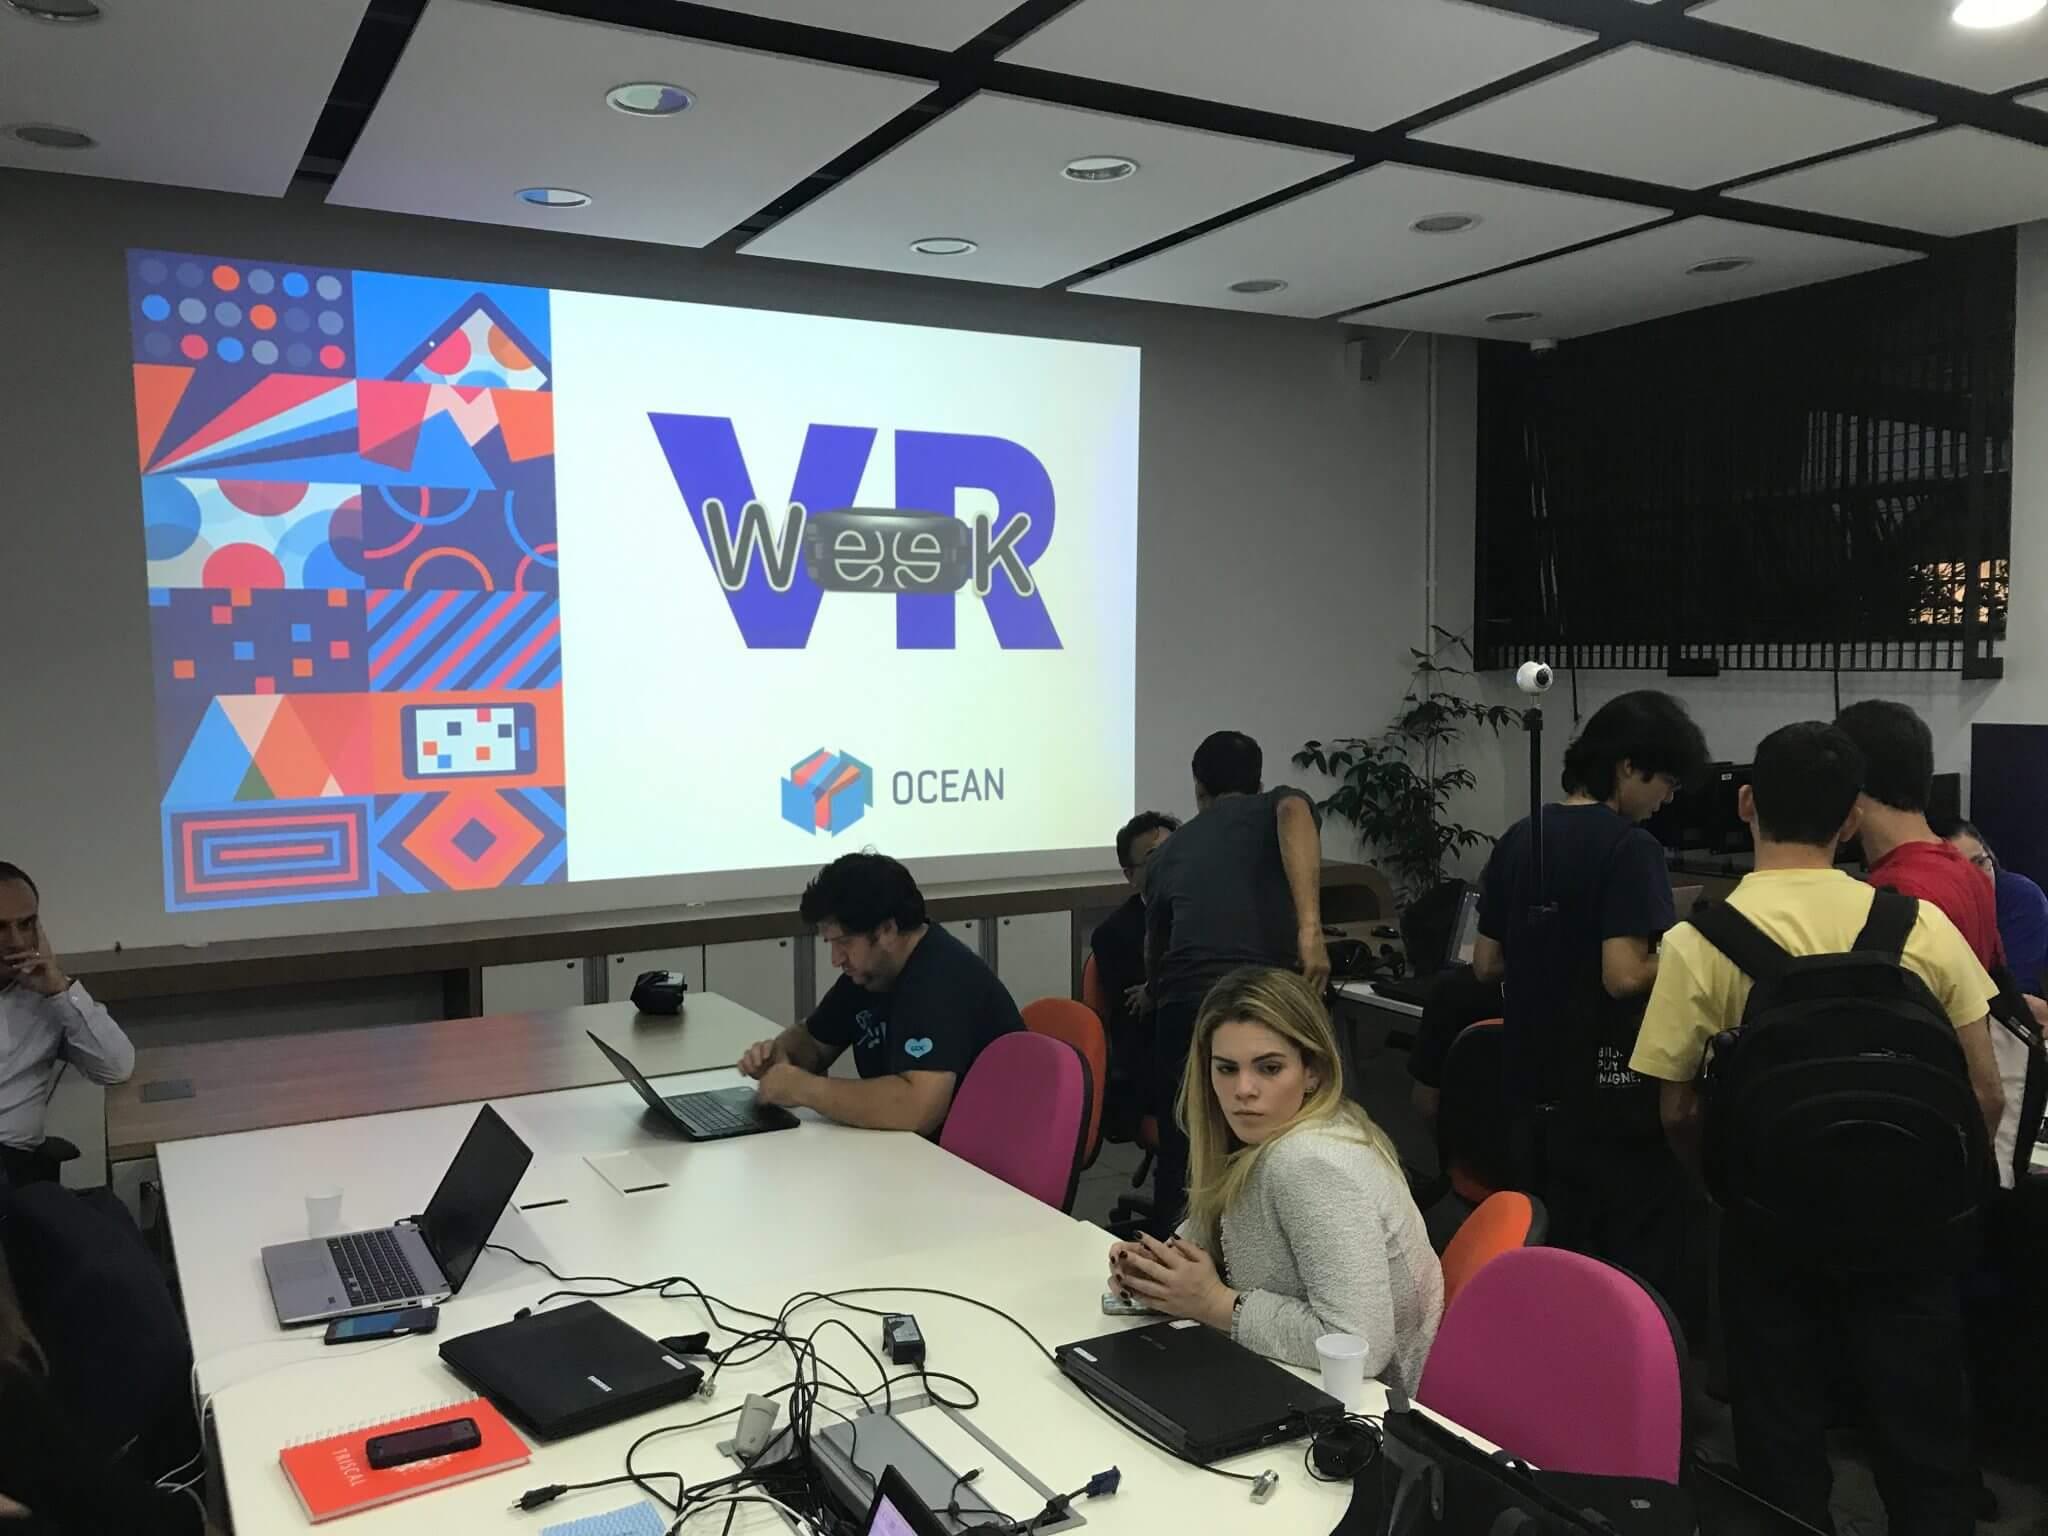 IMG 1680 - Como a Realidade Virtual vai revolucionar as nossas vidas?